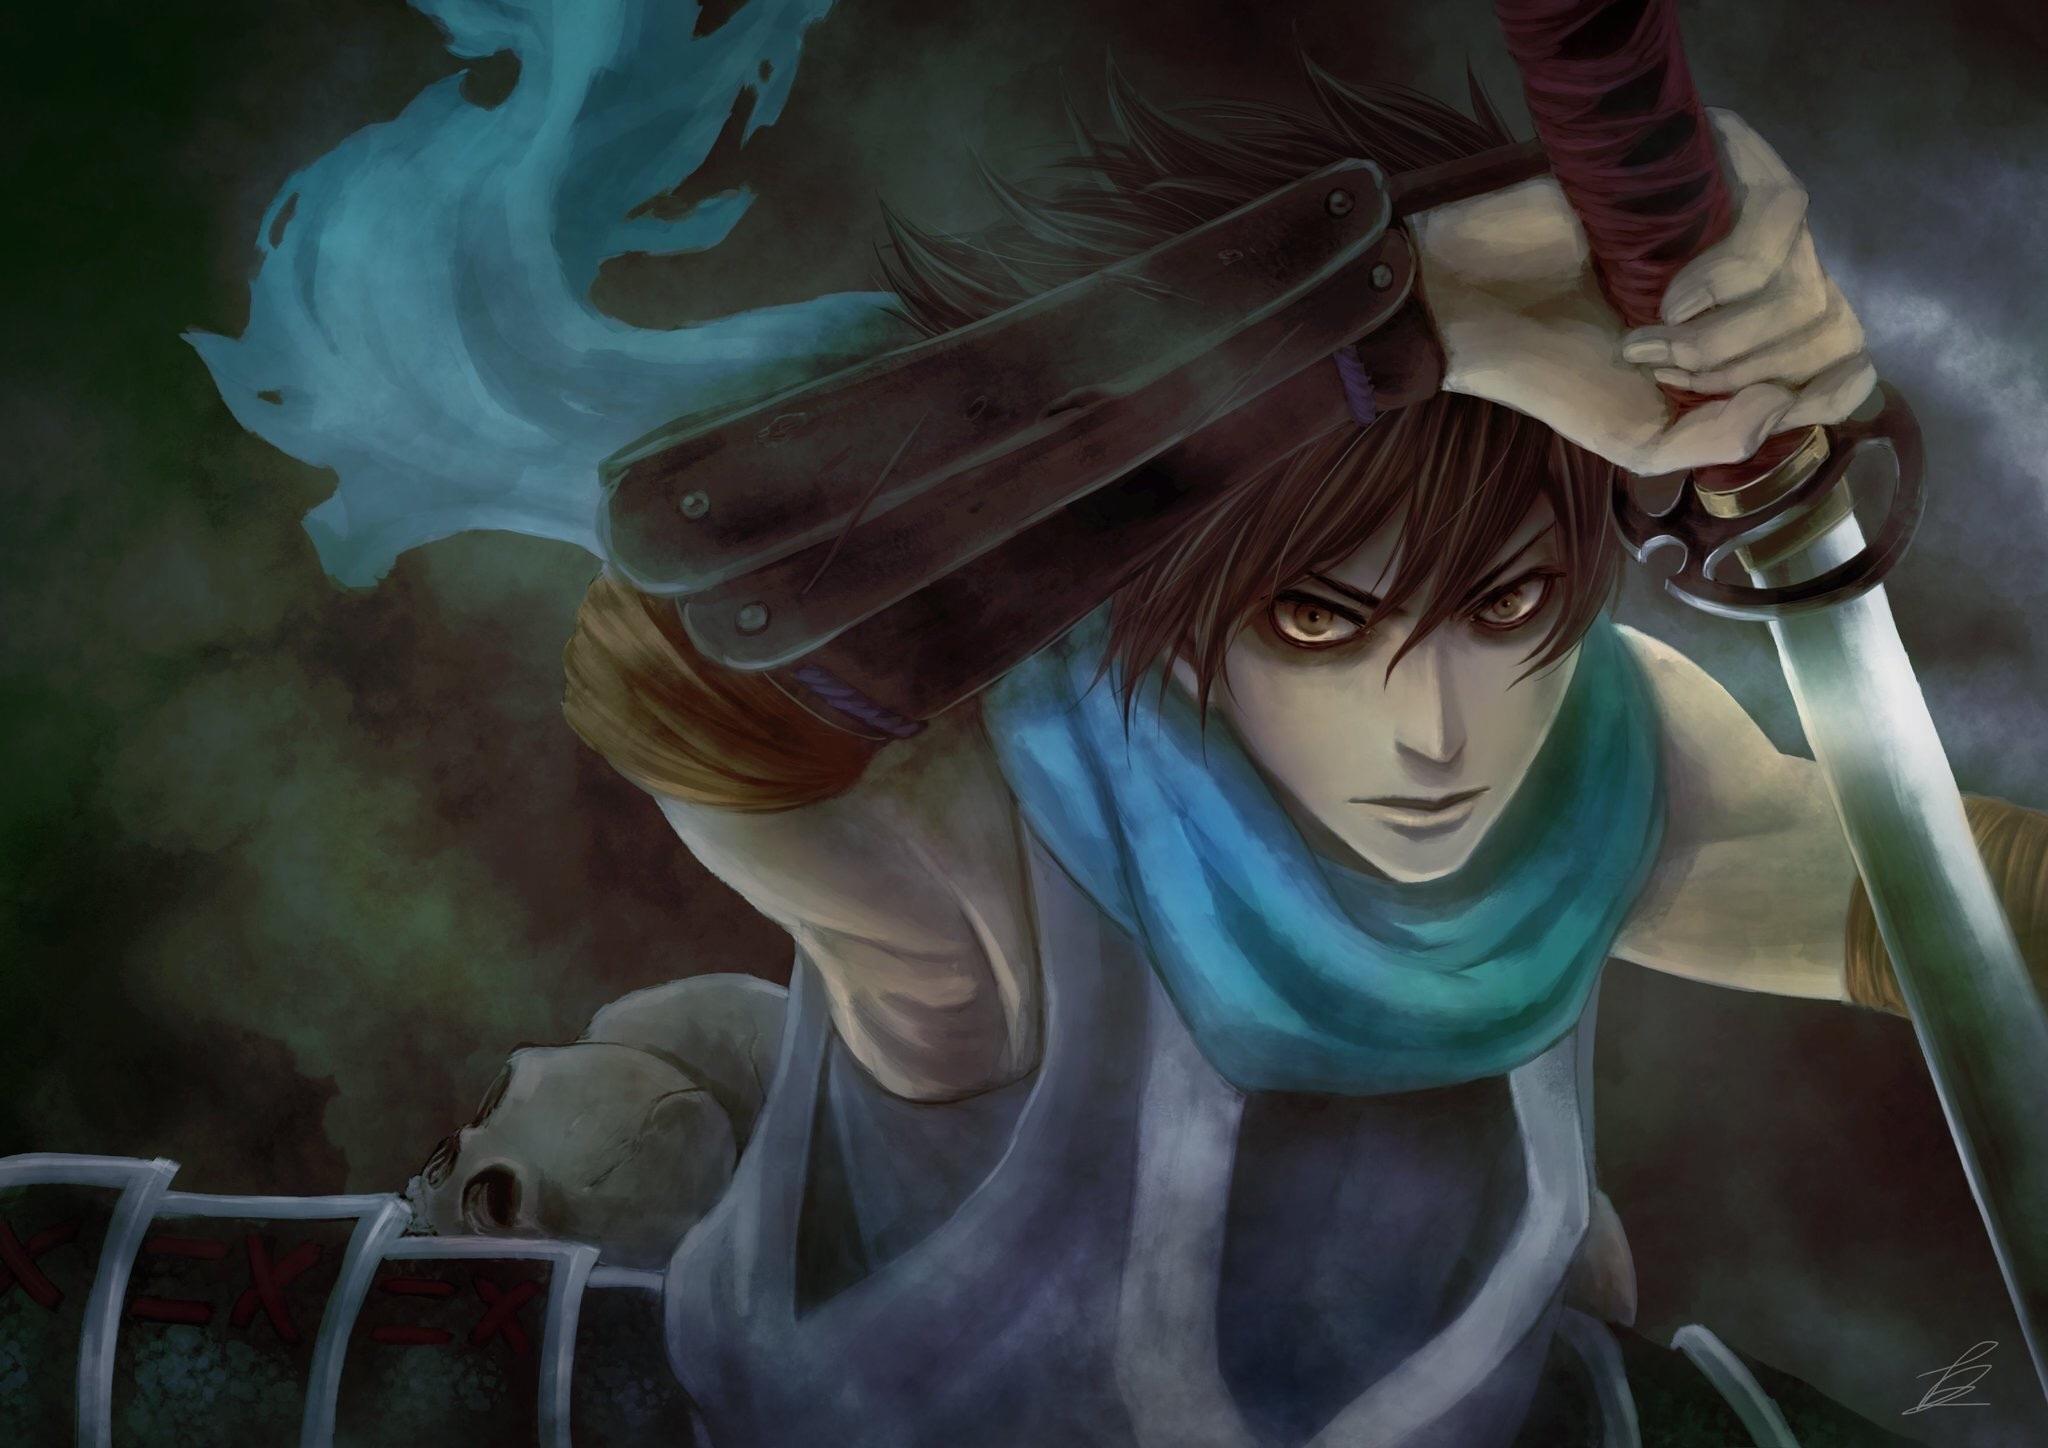 Muramasa The Demon Blade Hd Wallpaper Background Image